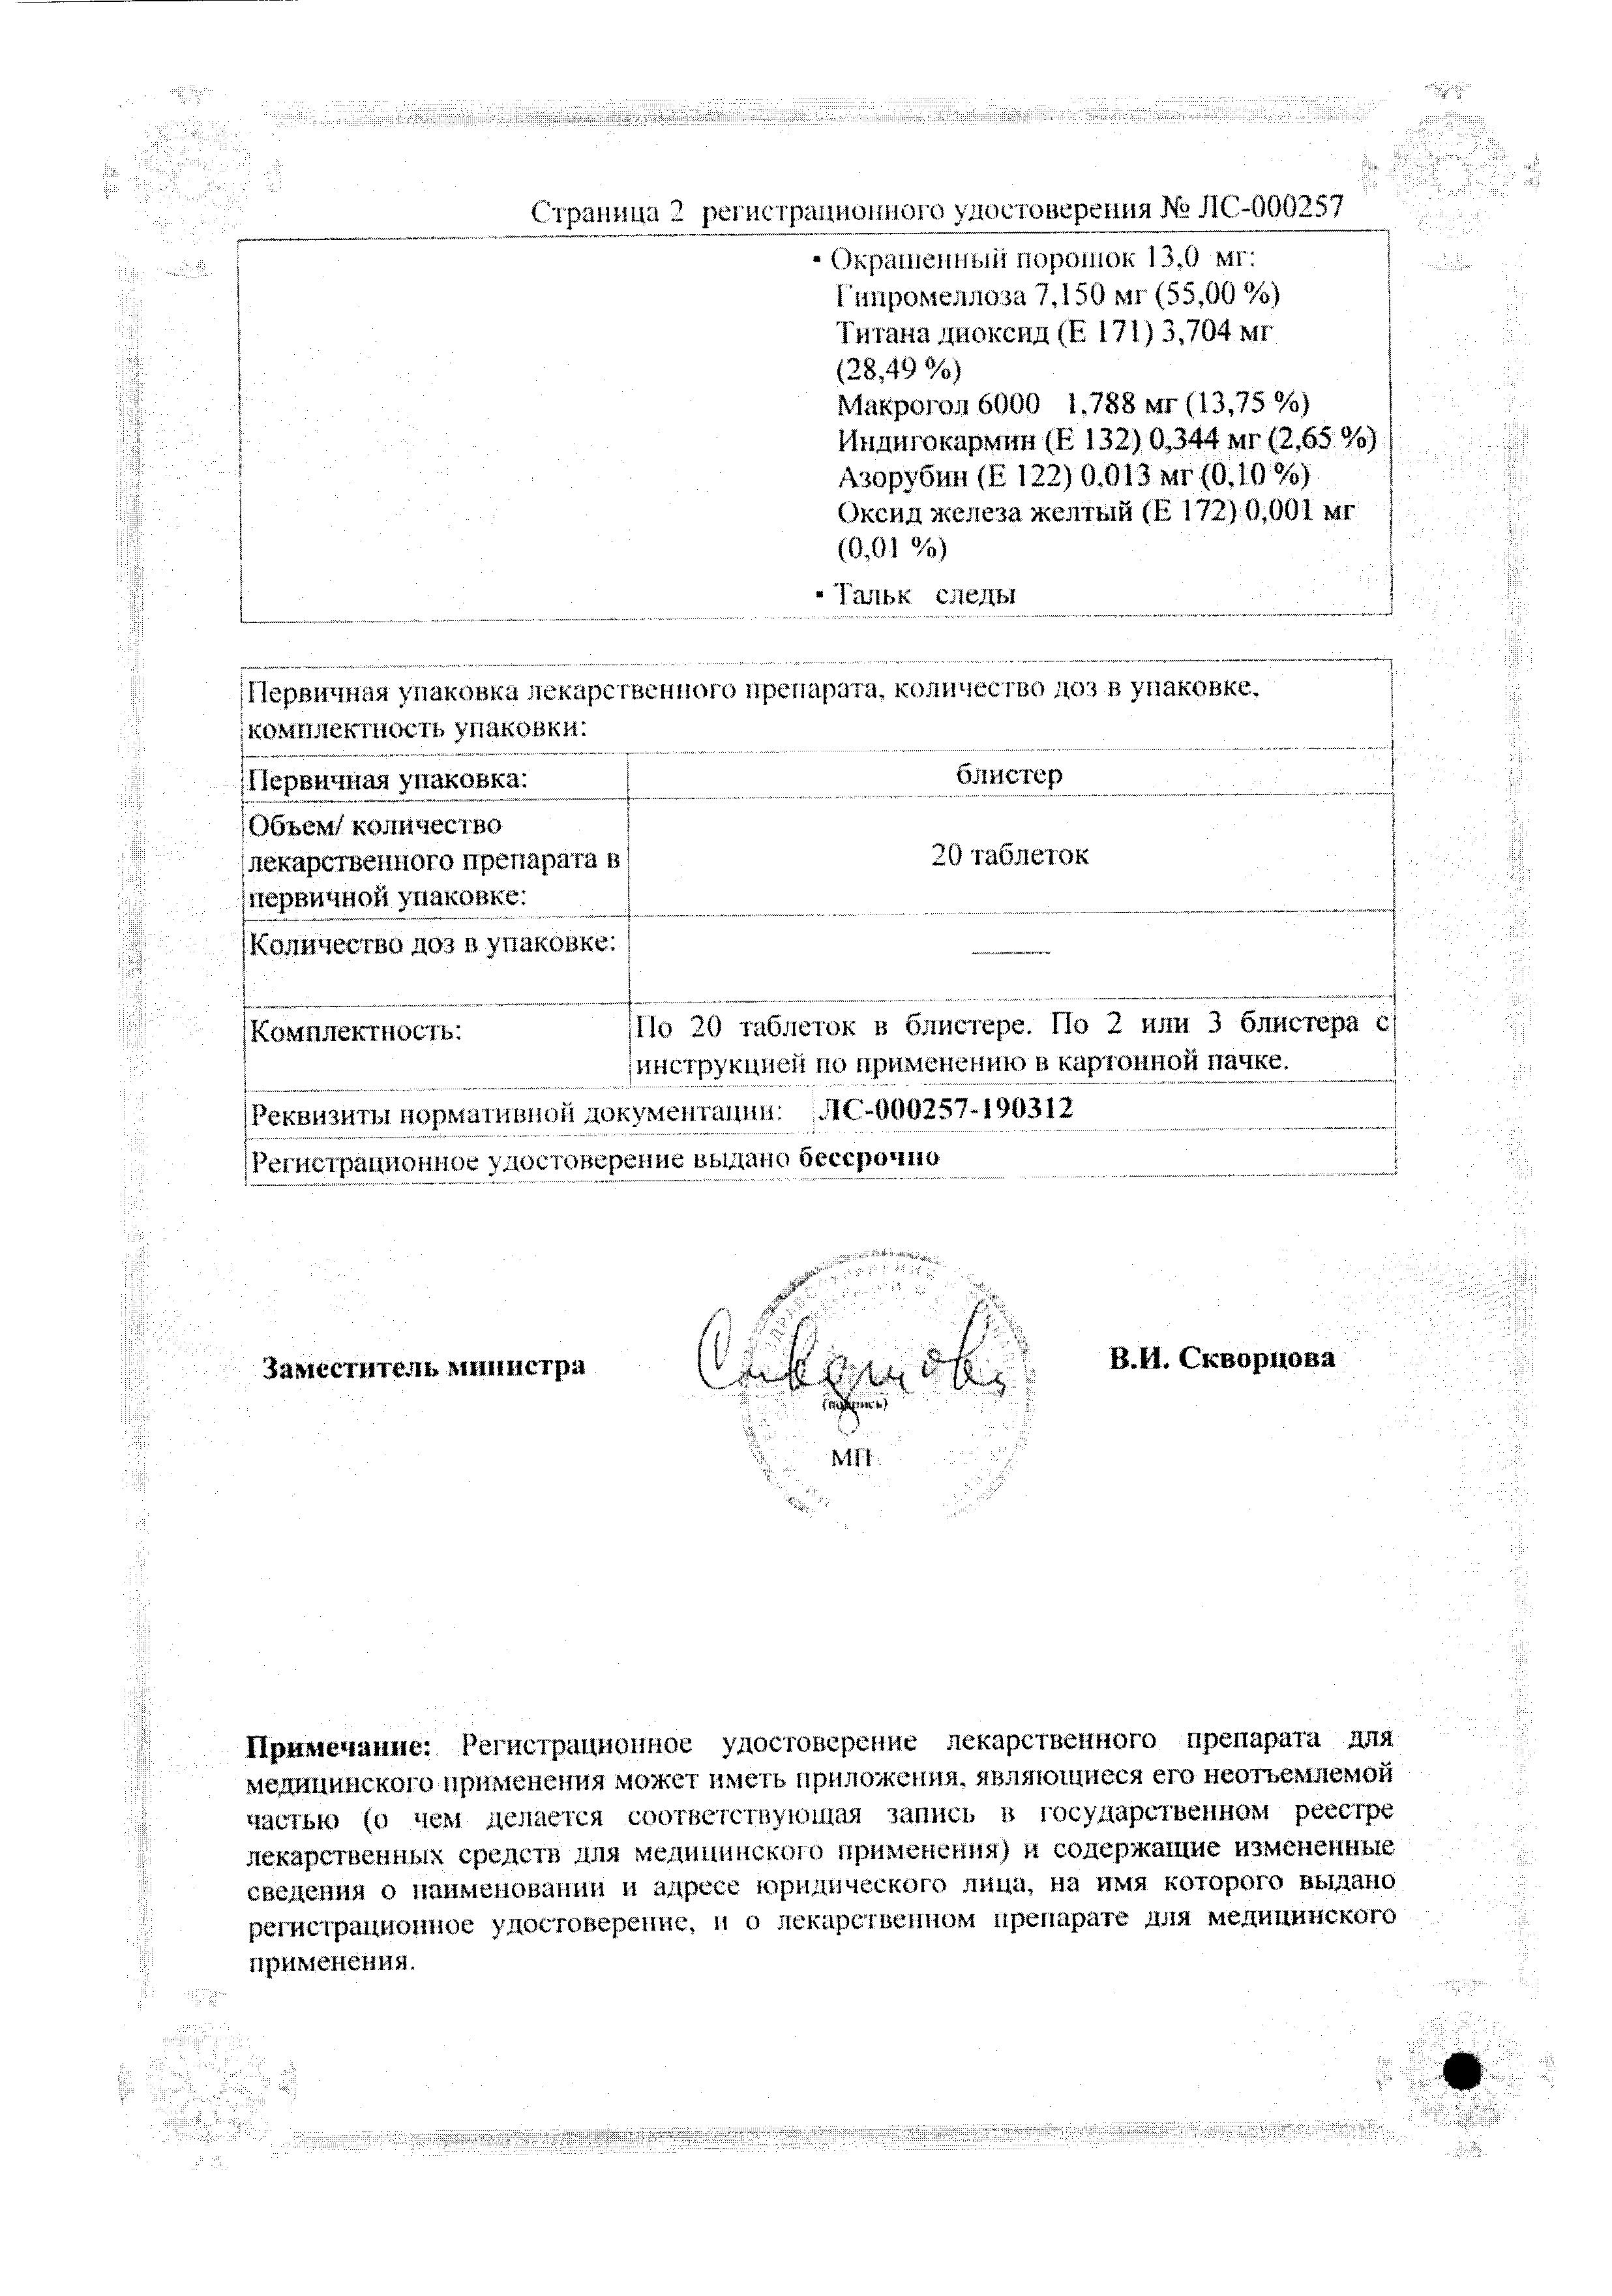 Симпатил сертификат